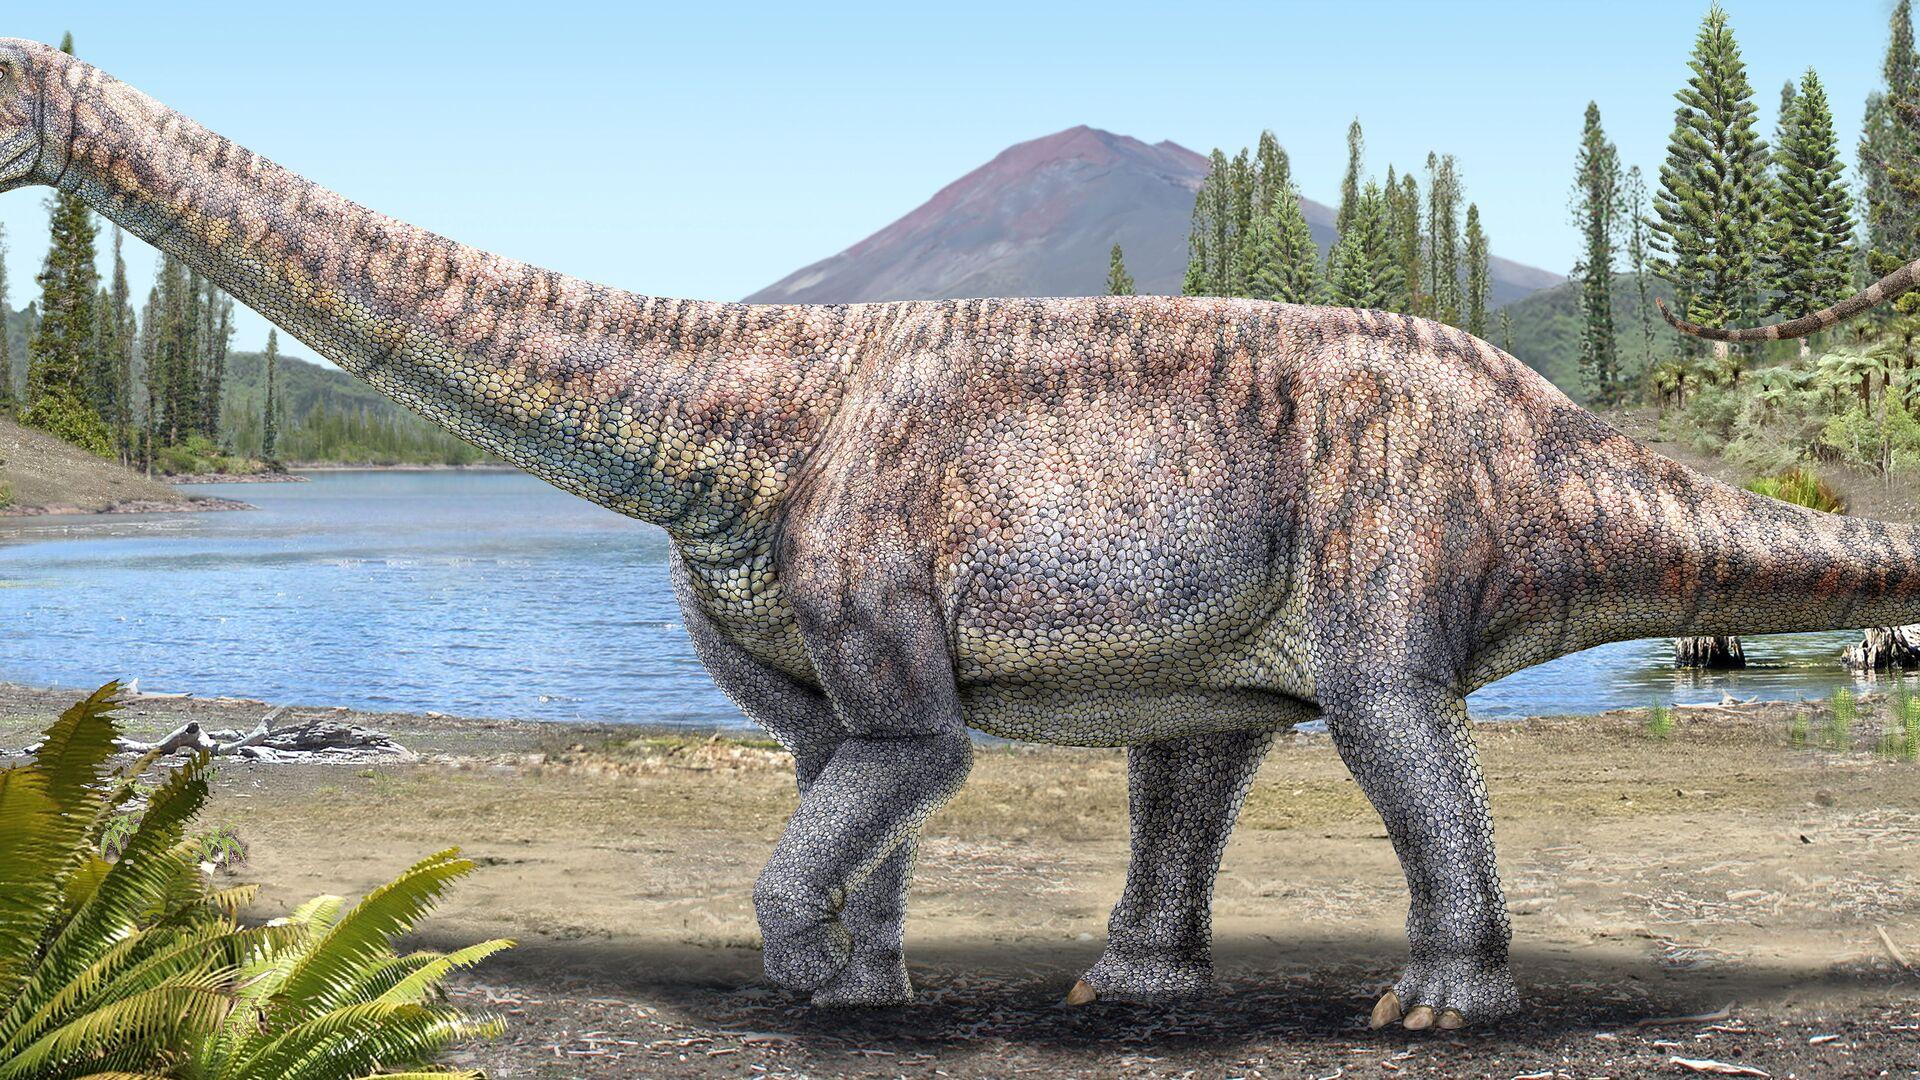 Dinosauro Arackar licanantay - Sputnik Italia, 1920, 21.04.2021